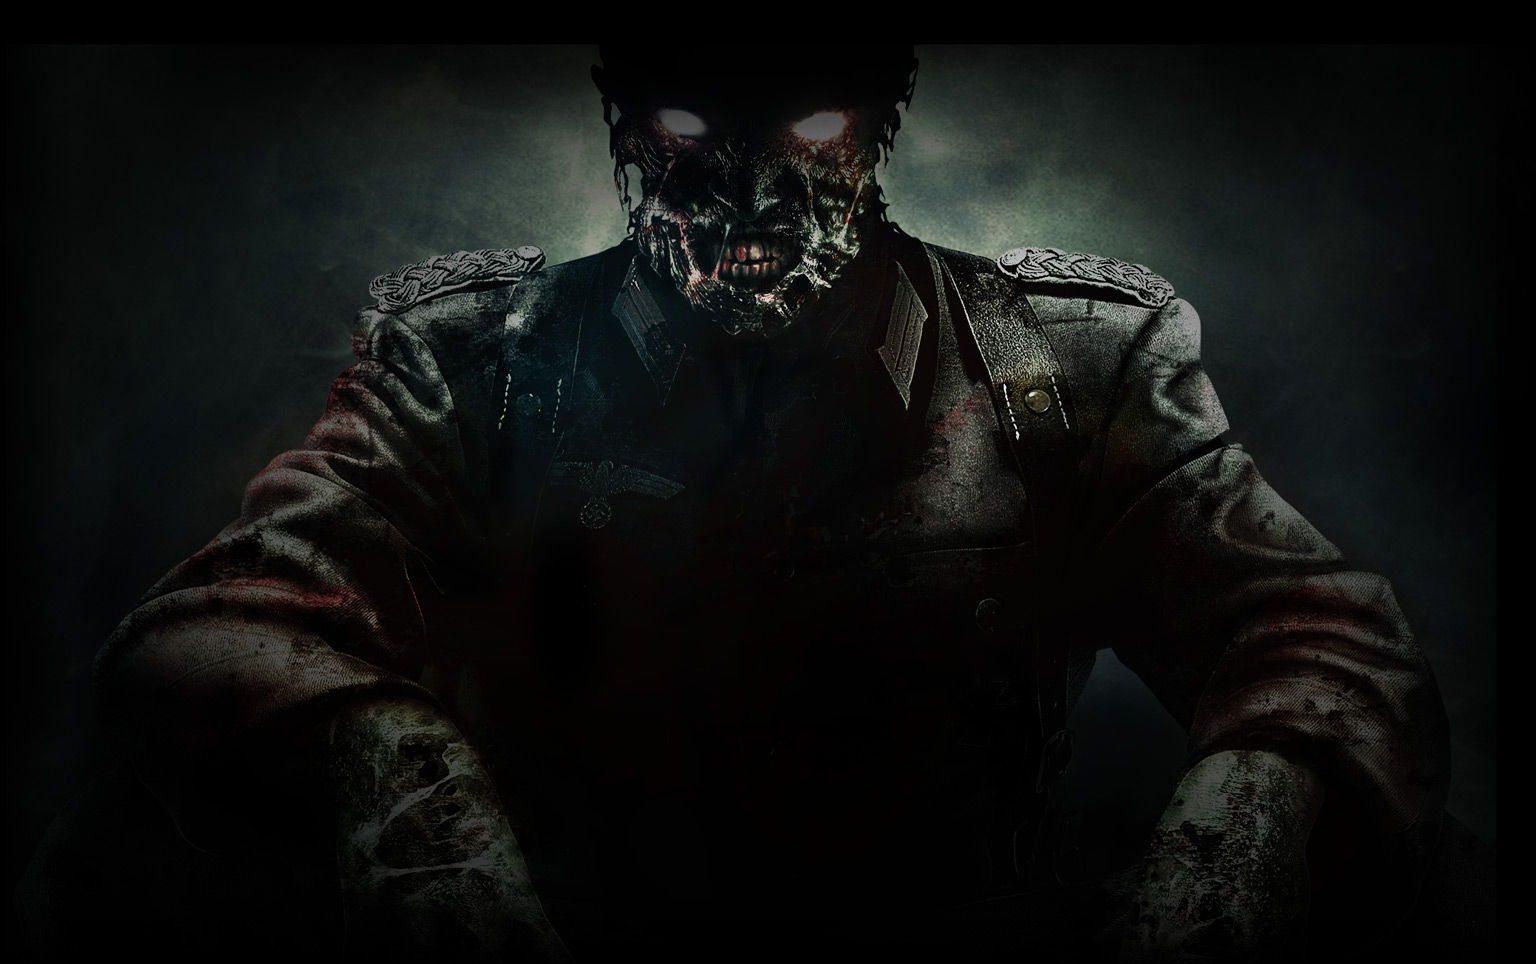 Modern Warfare Wallpaper Hd Cccp Ops